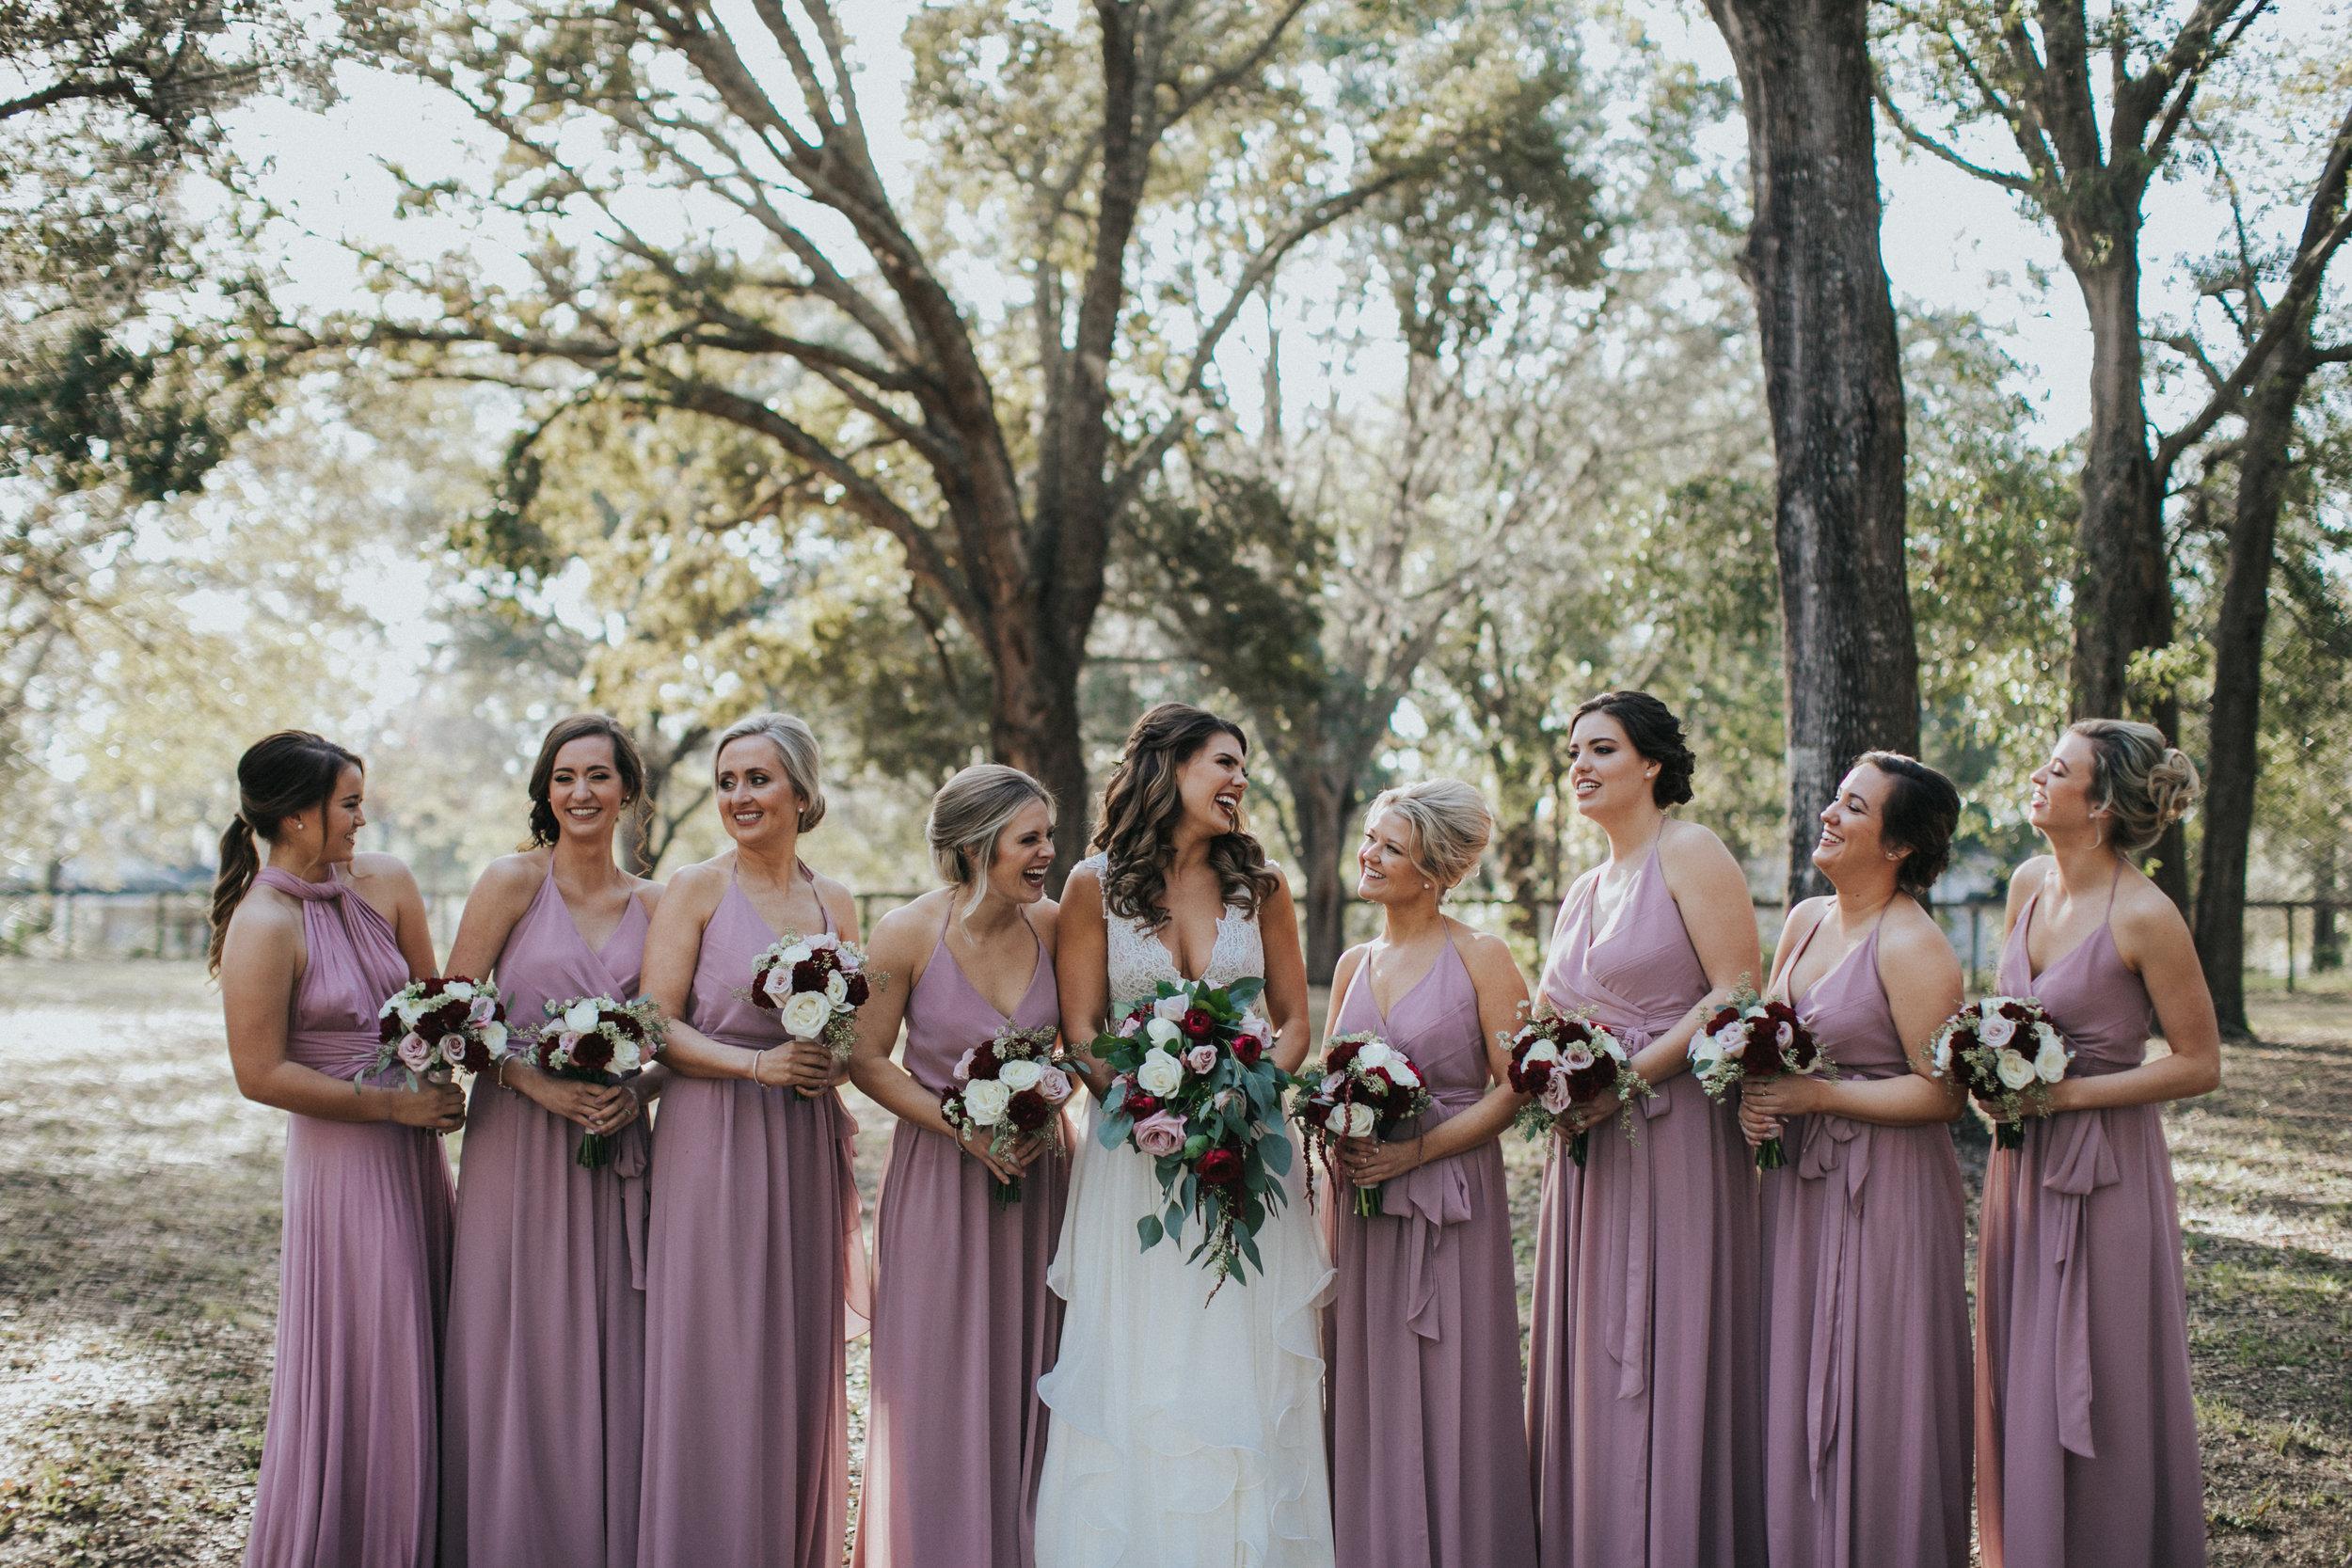 Bluegrass Chic - Dusty Rose Bridesmaids